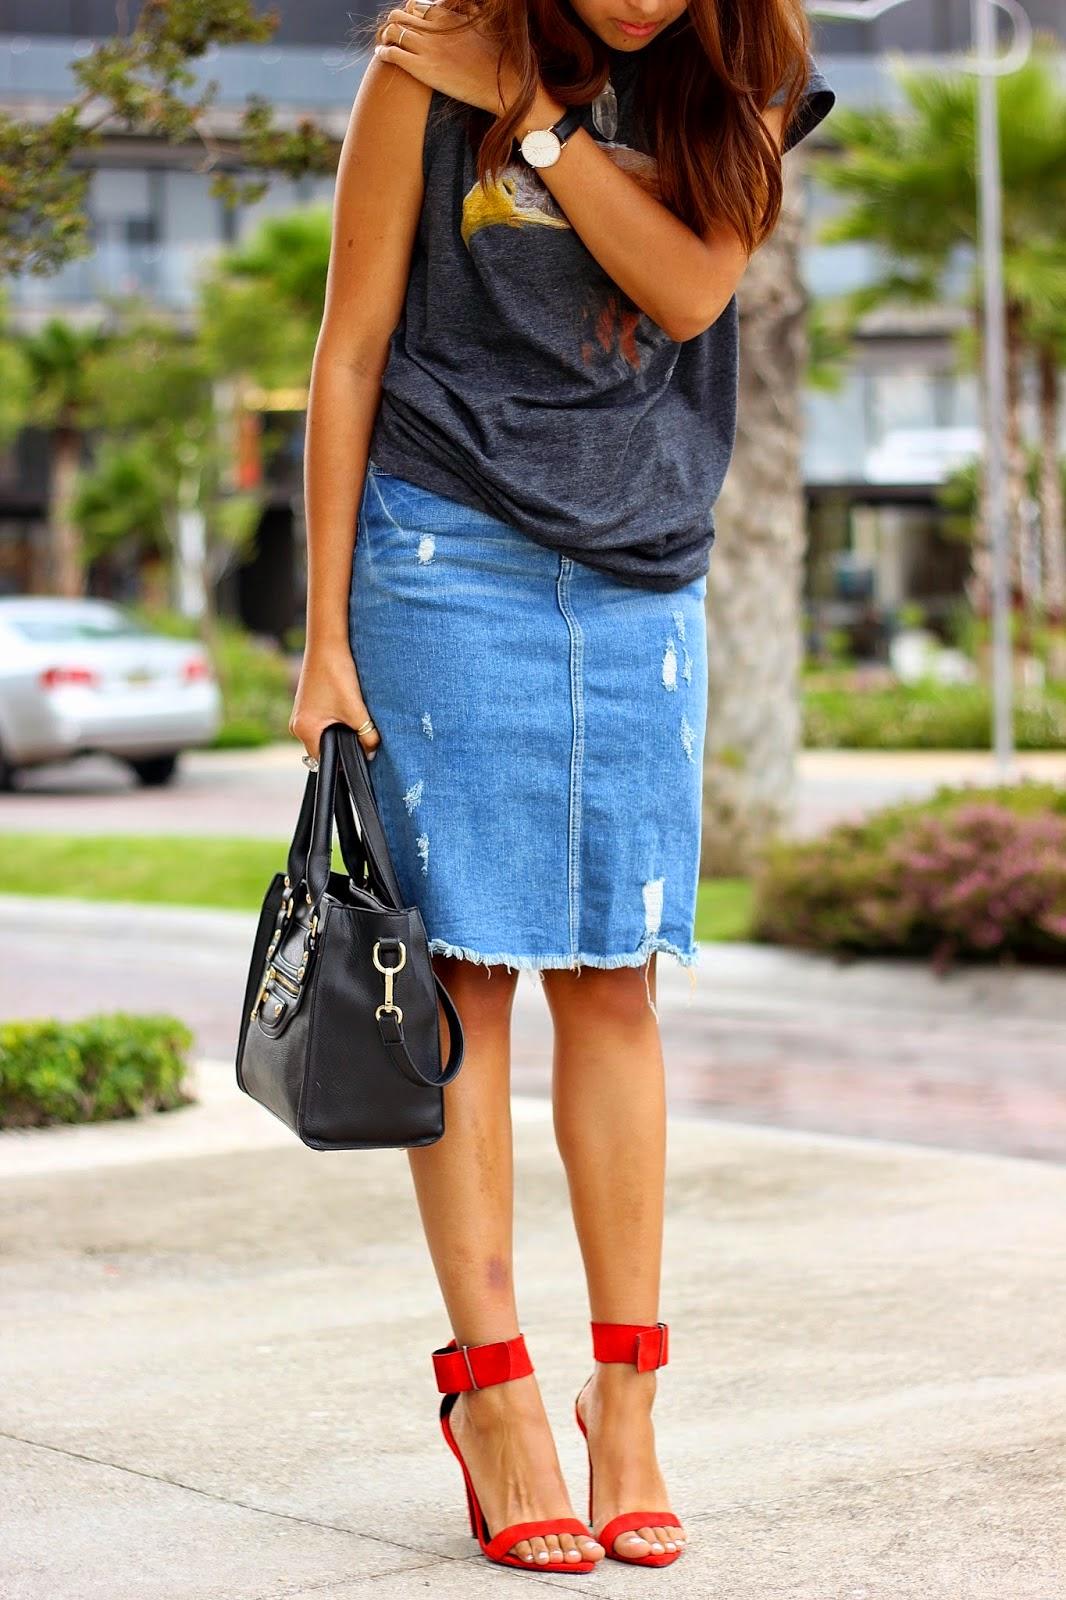 trend alert the distressed denim pencil skirt miss